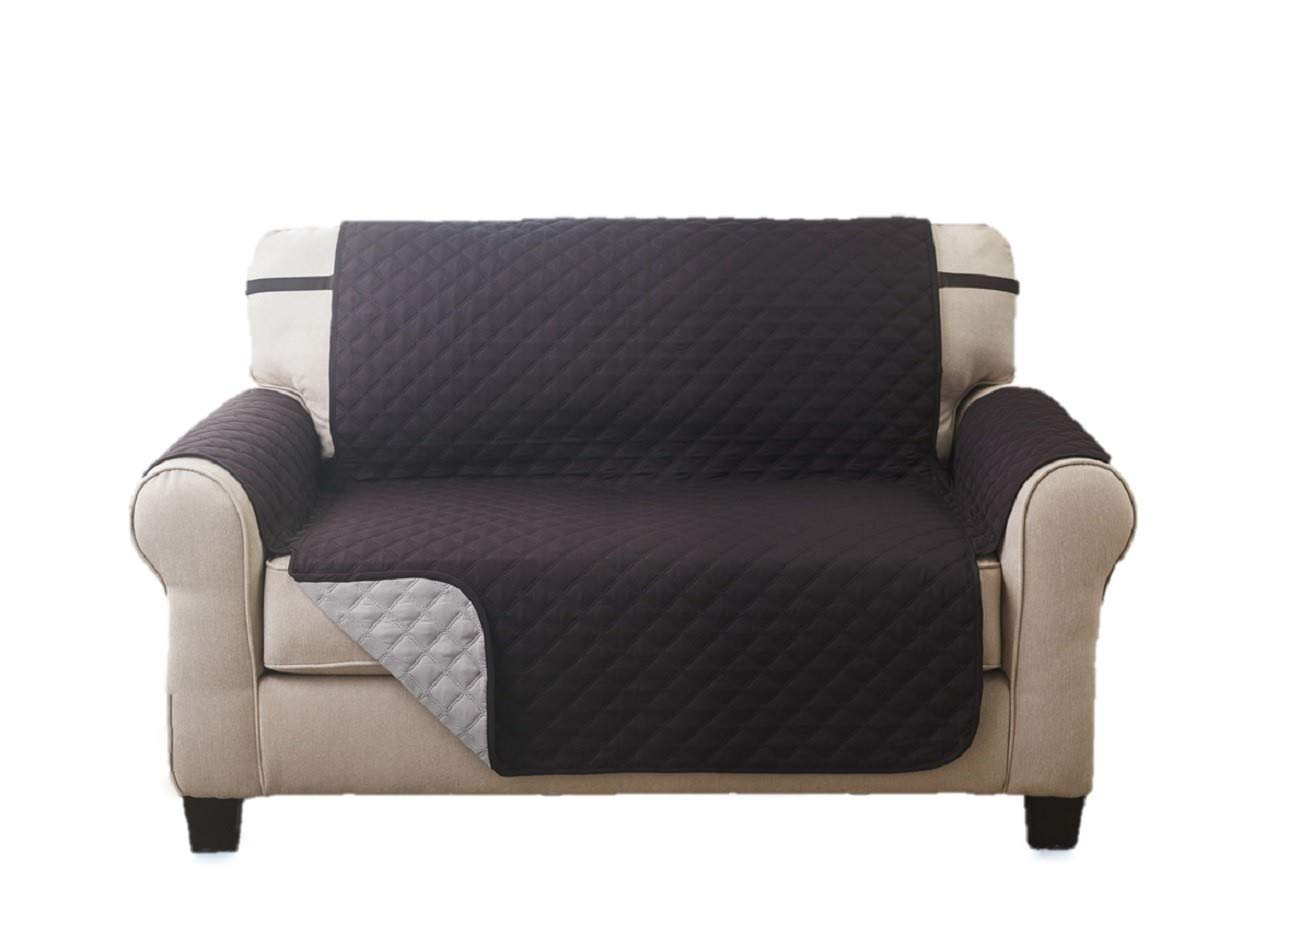 Elegante Luxurious Reversible LOVESEAT Furniture Protector, Black / Grey 75x88 Sara Ashley SYNCHKG060523